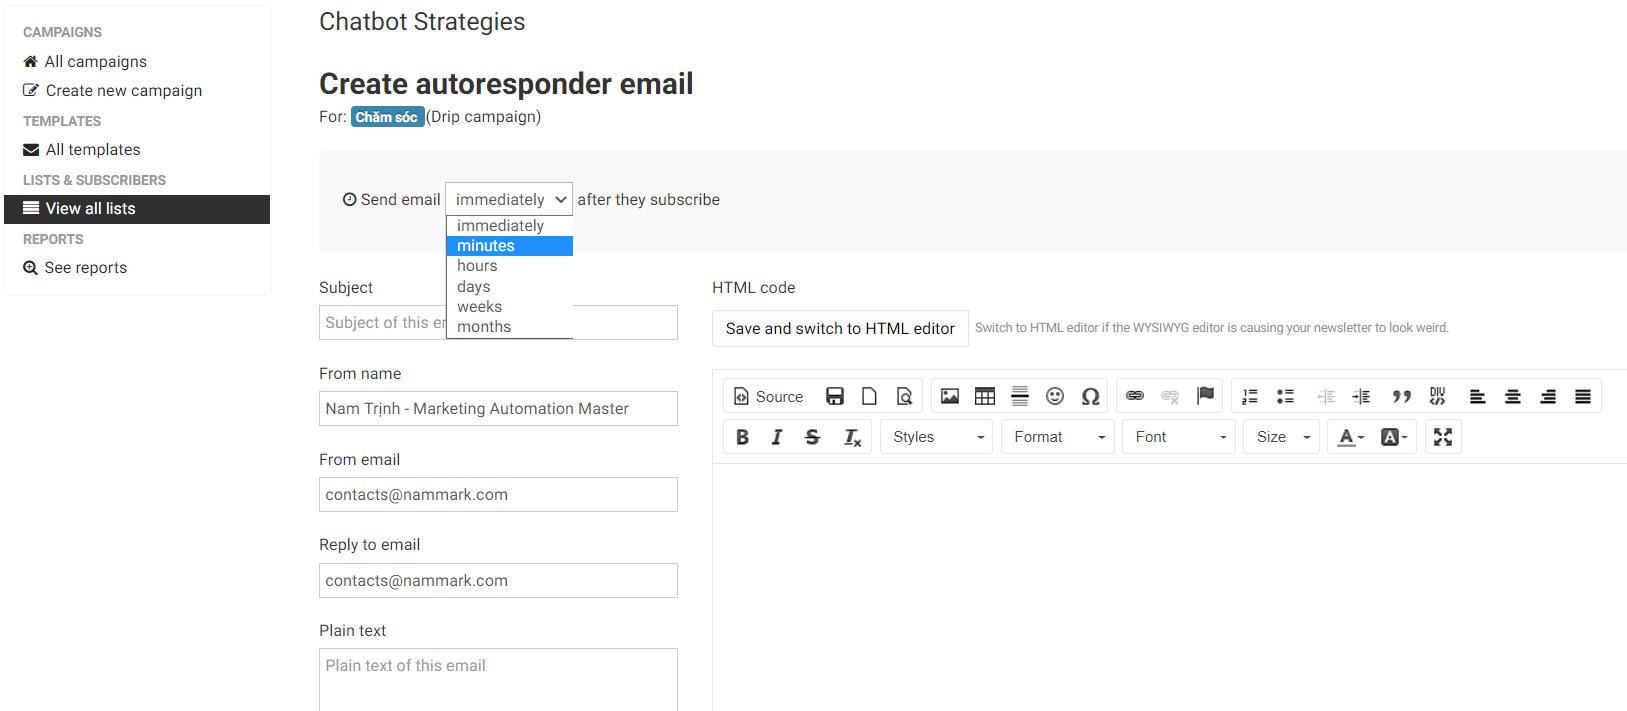 them-email-vao-chuoi-cham-soc-email-marketing-sendy-nammark